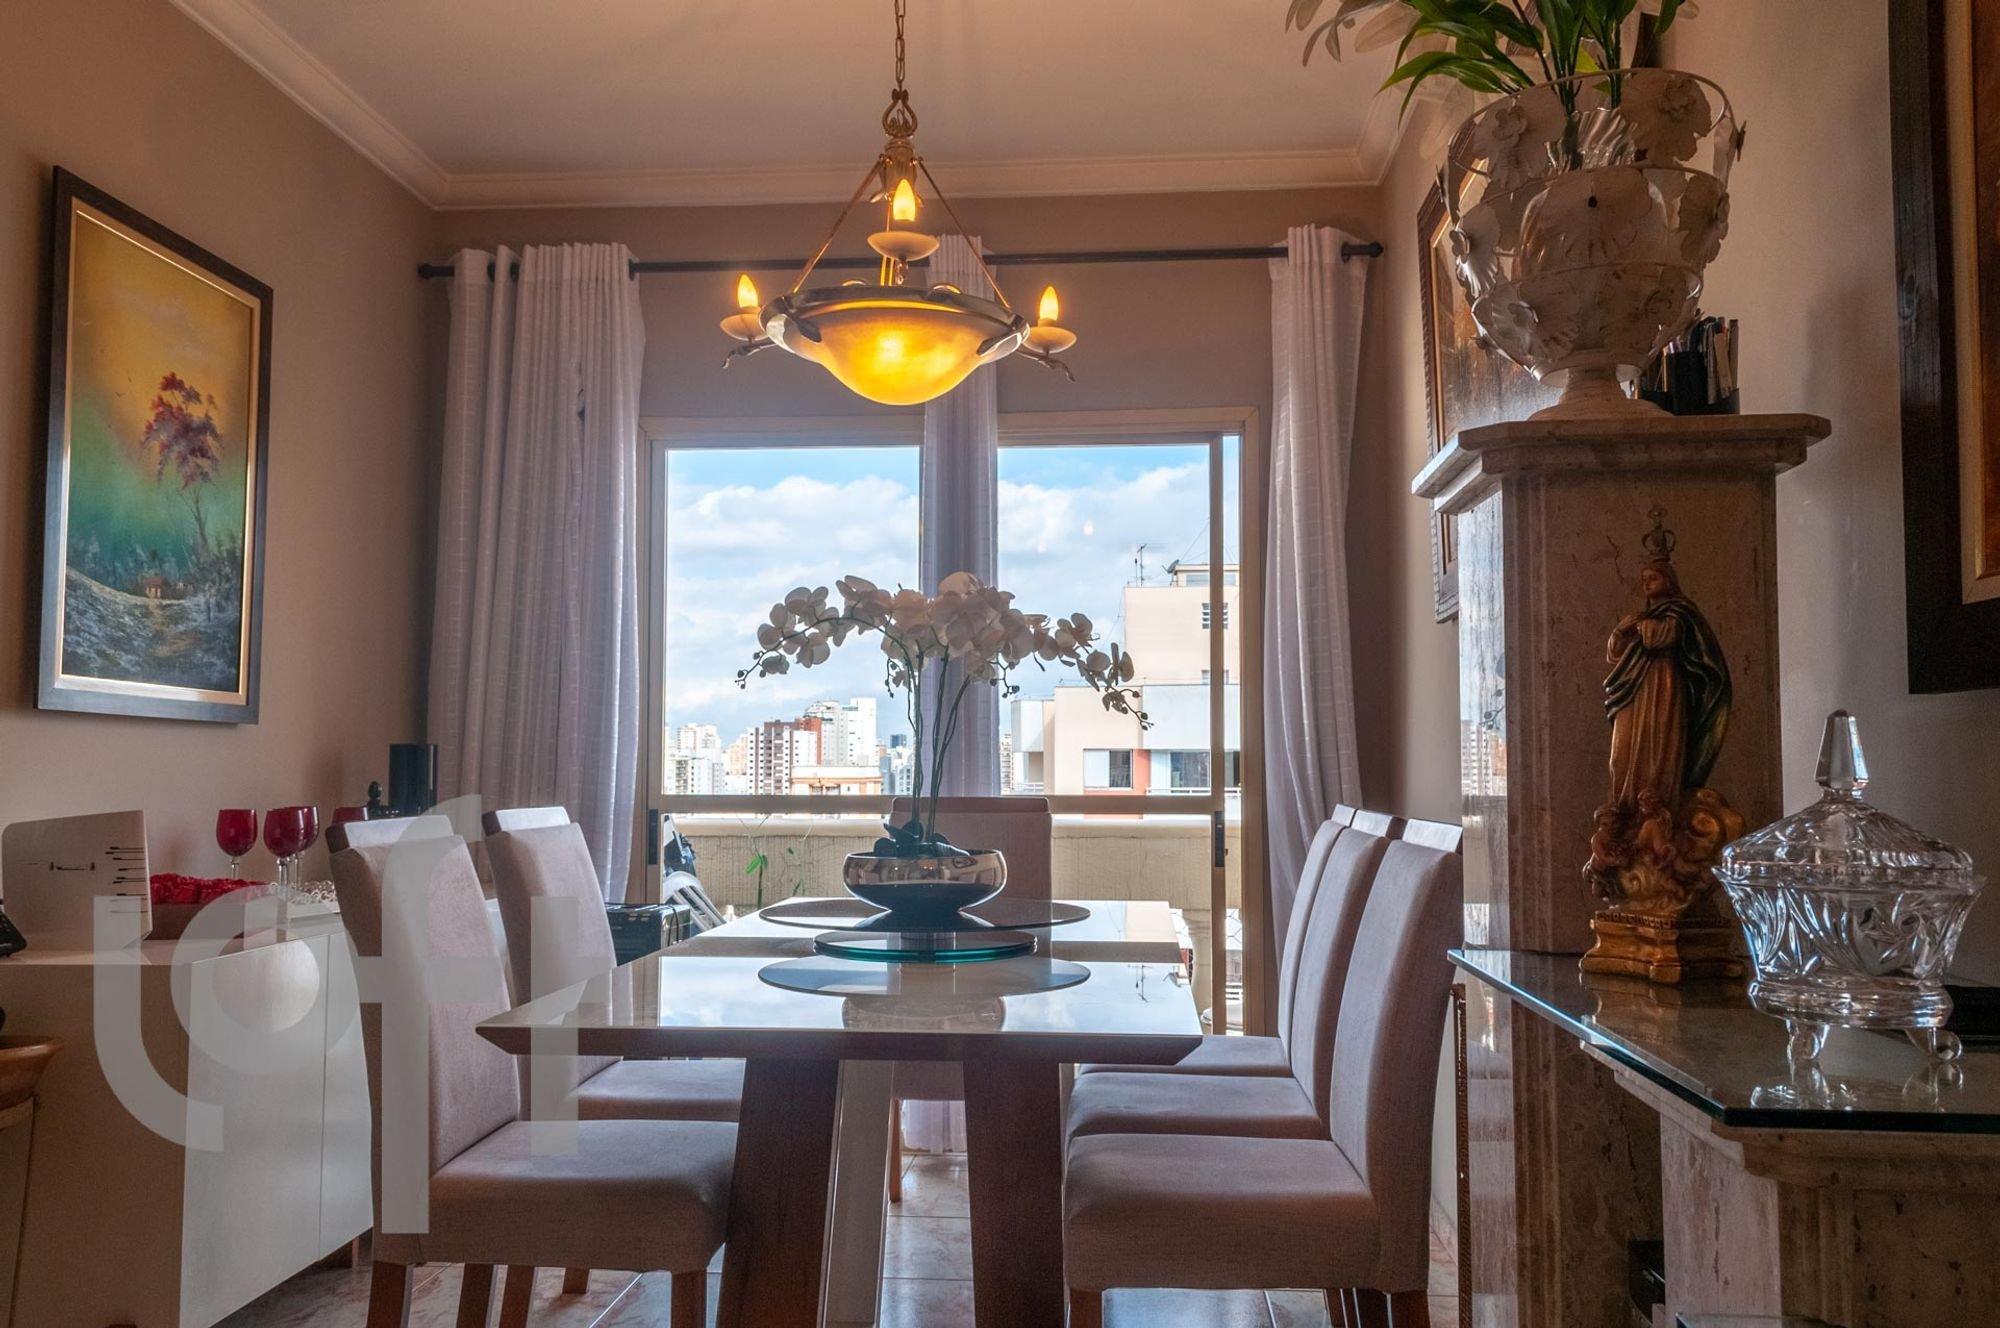 Foto de Hall com vaso de planta, vaso, cadeira, mesa de jantar